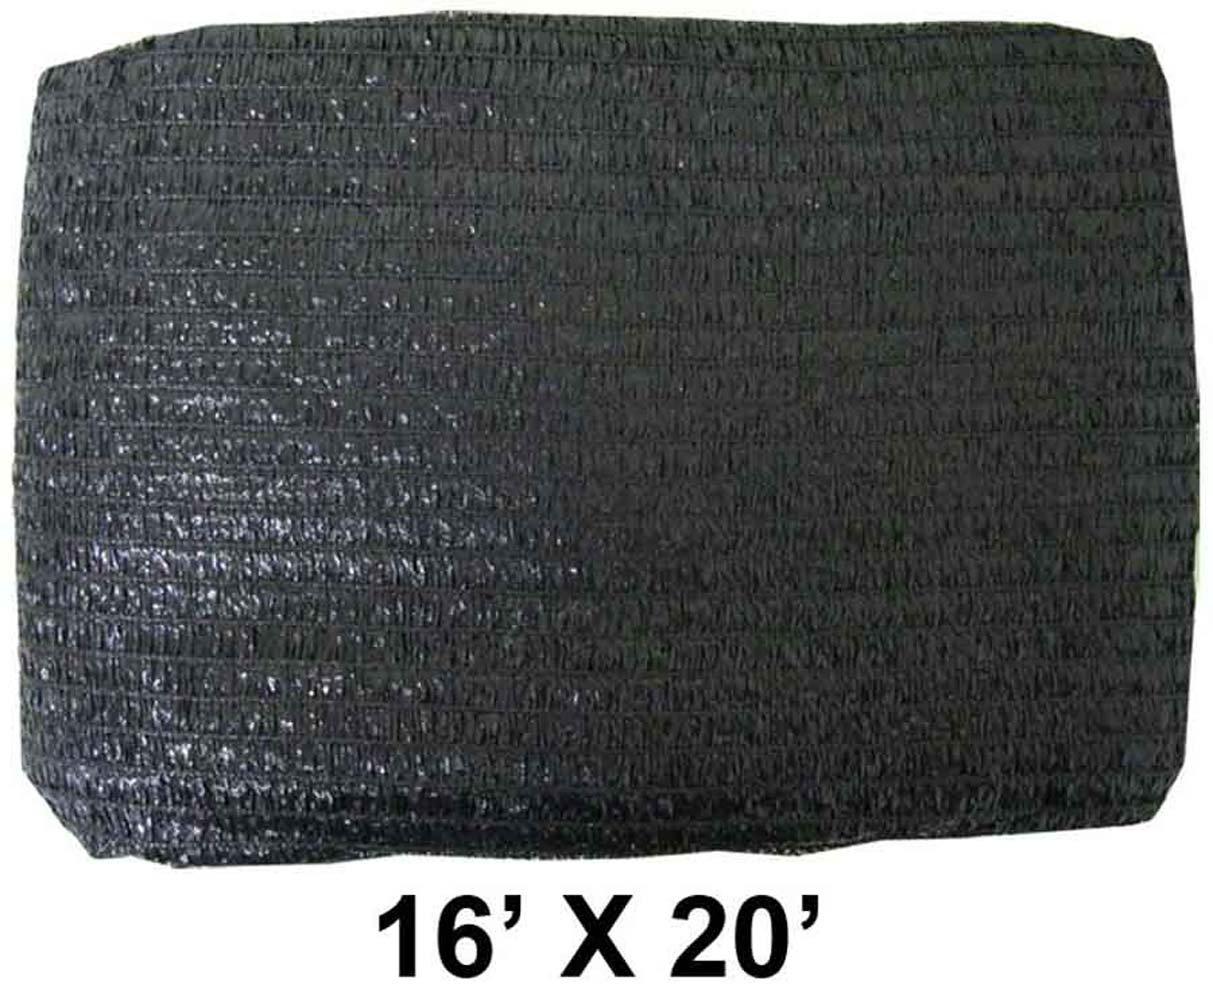 HAWK 16' X 20' BLACK SUNSHADE NET - TSB-1620